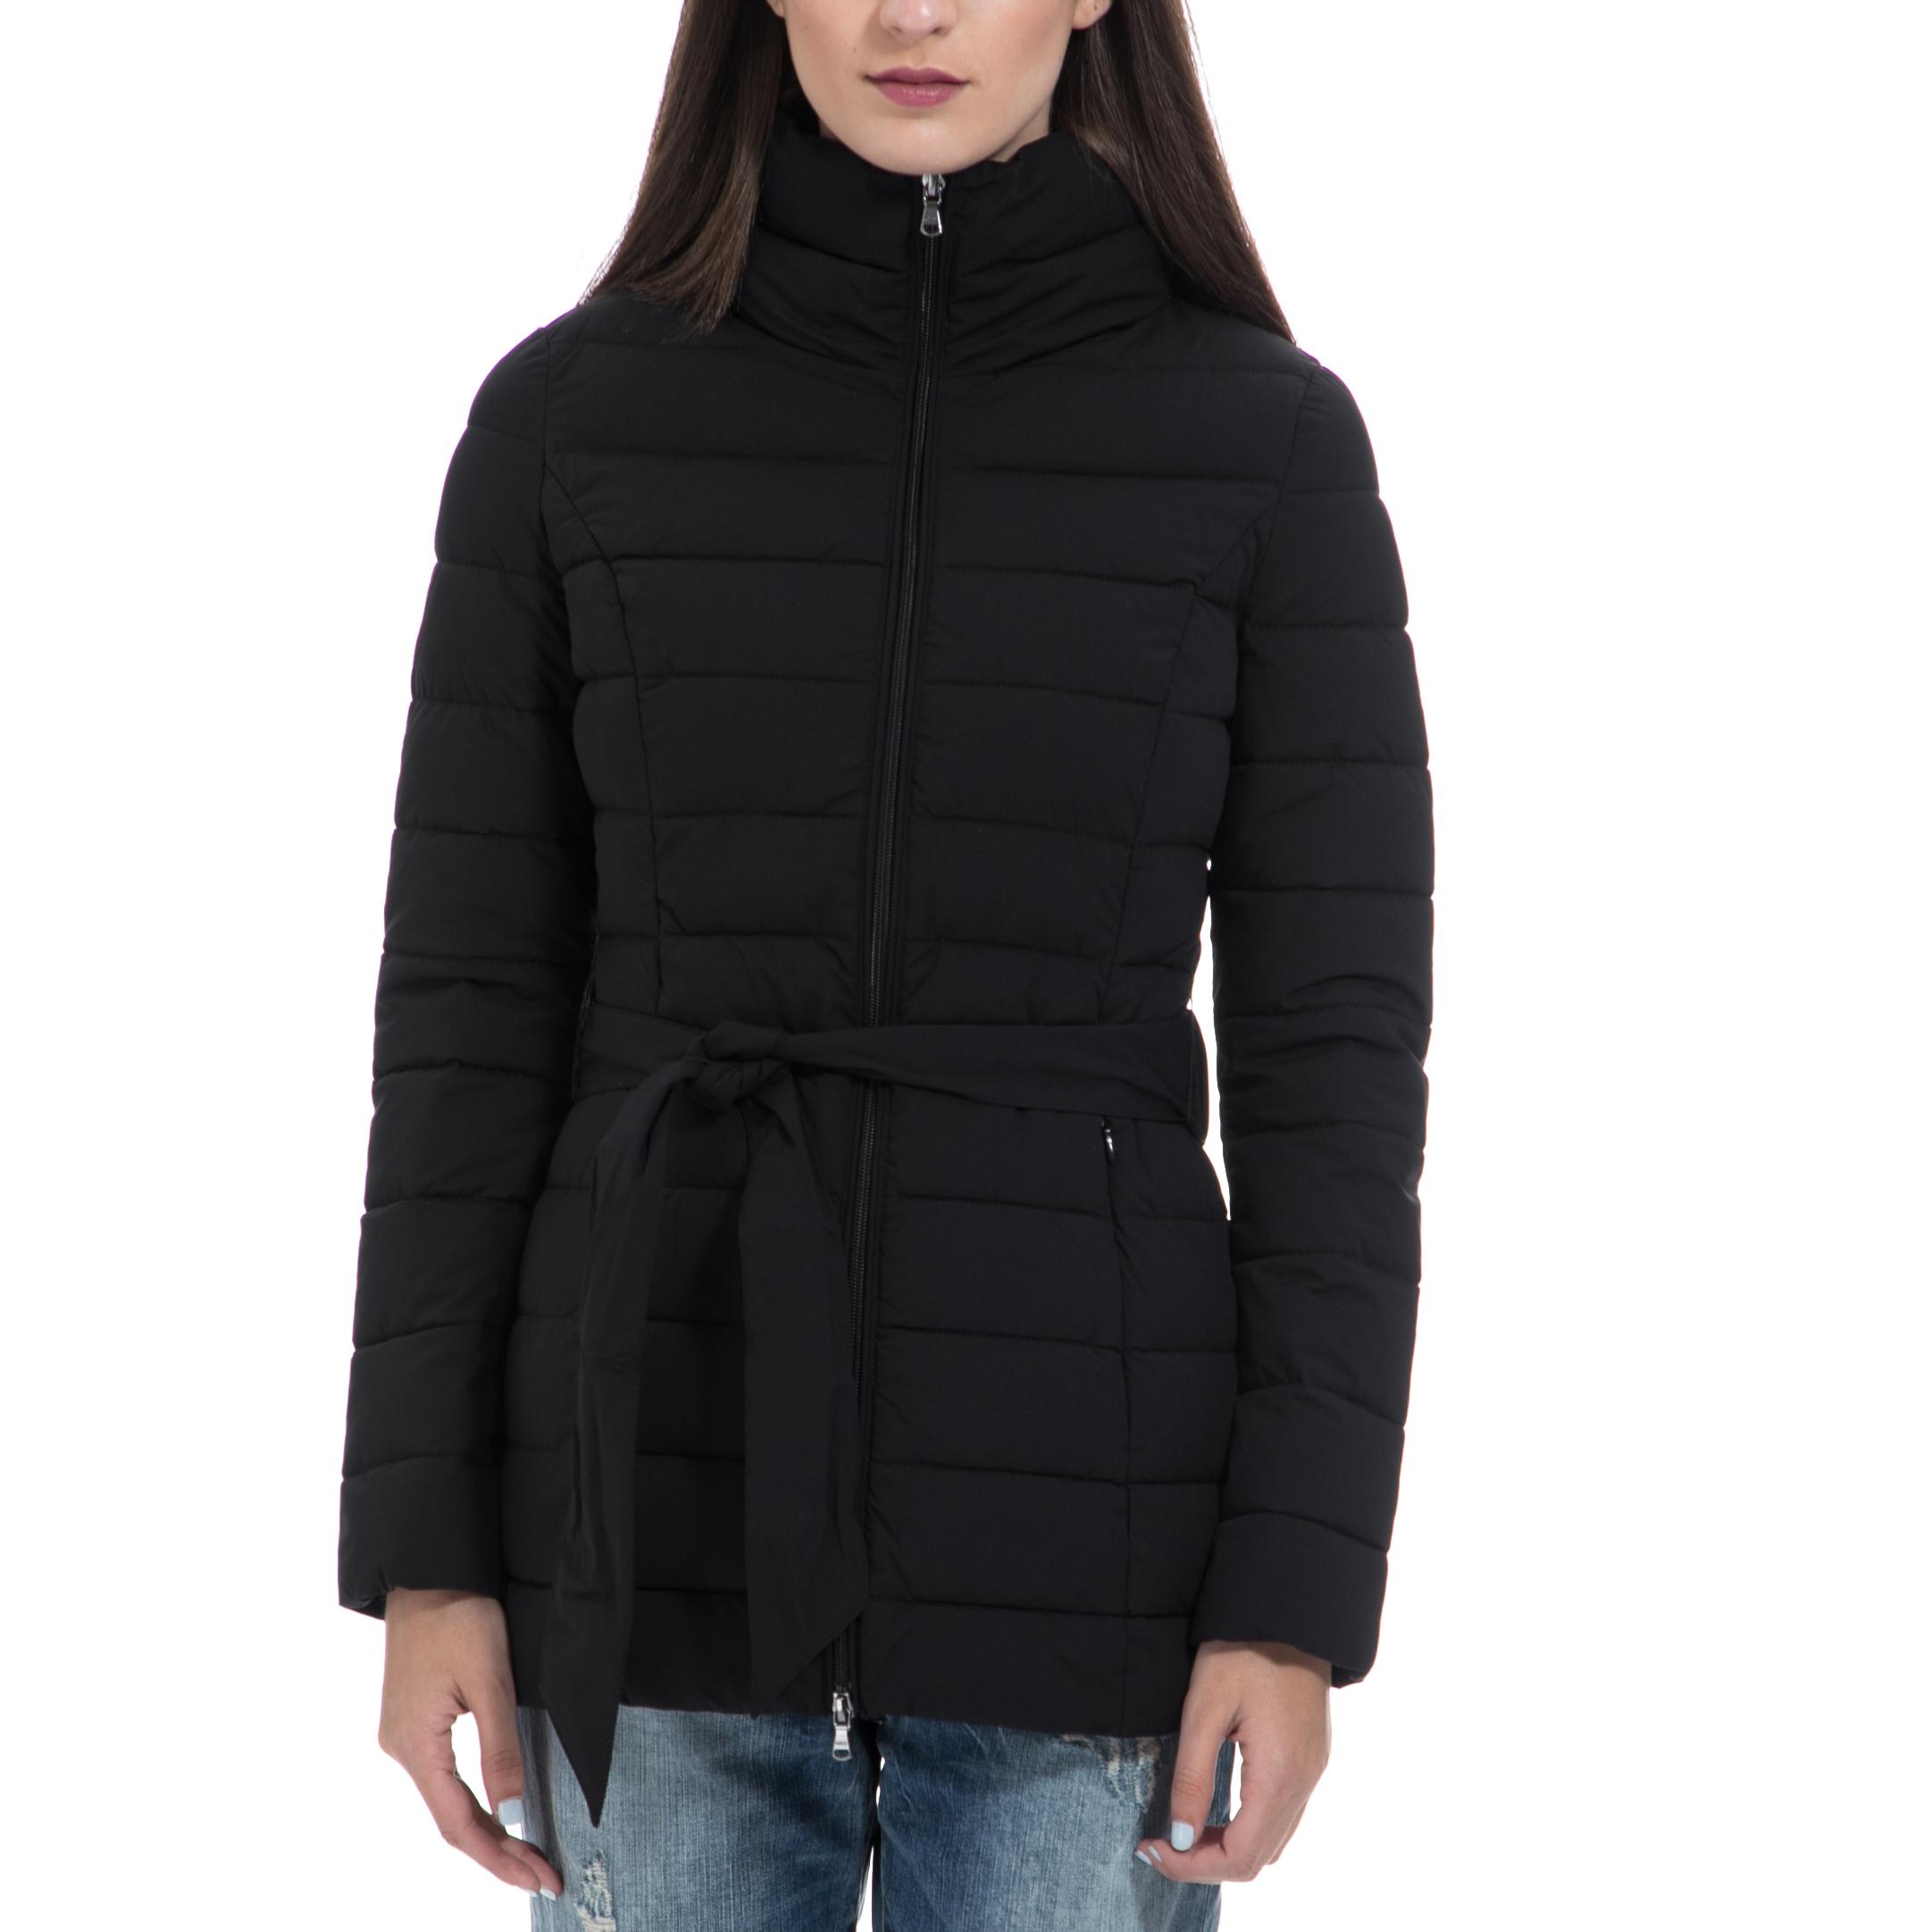 GUESS - Γυναικείο μπουφάν GUESS μαύρο